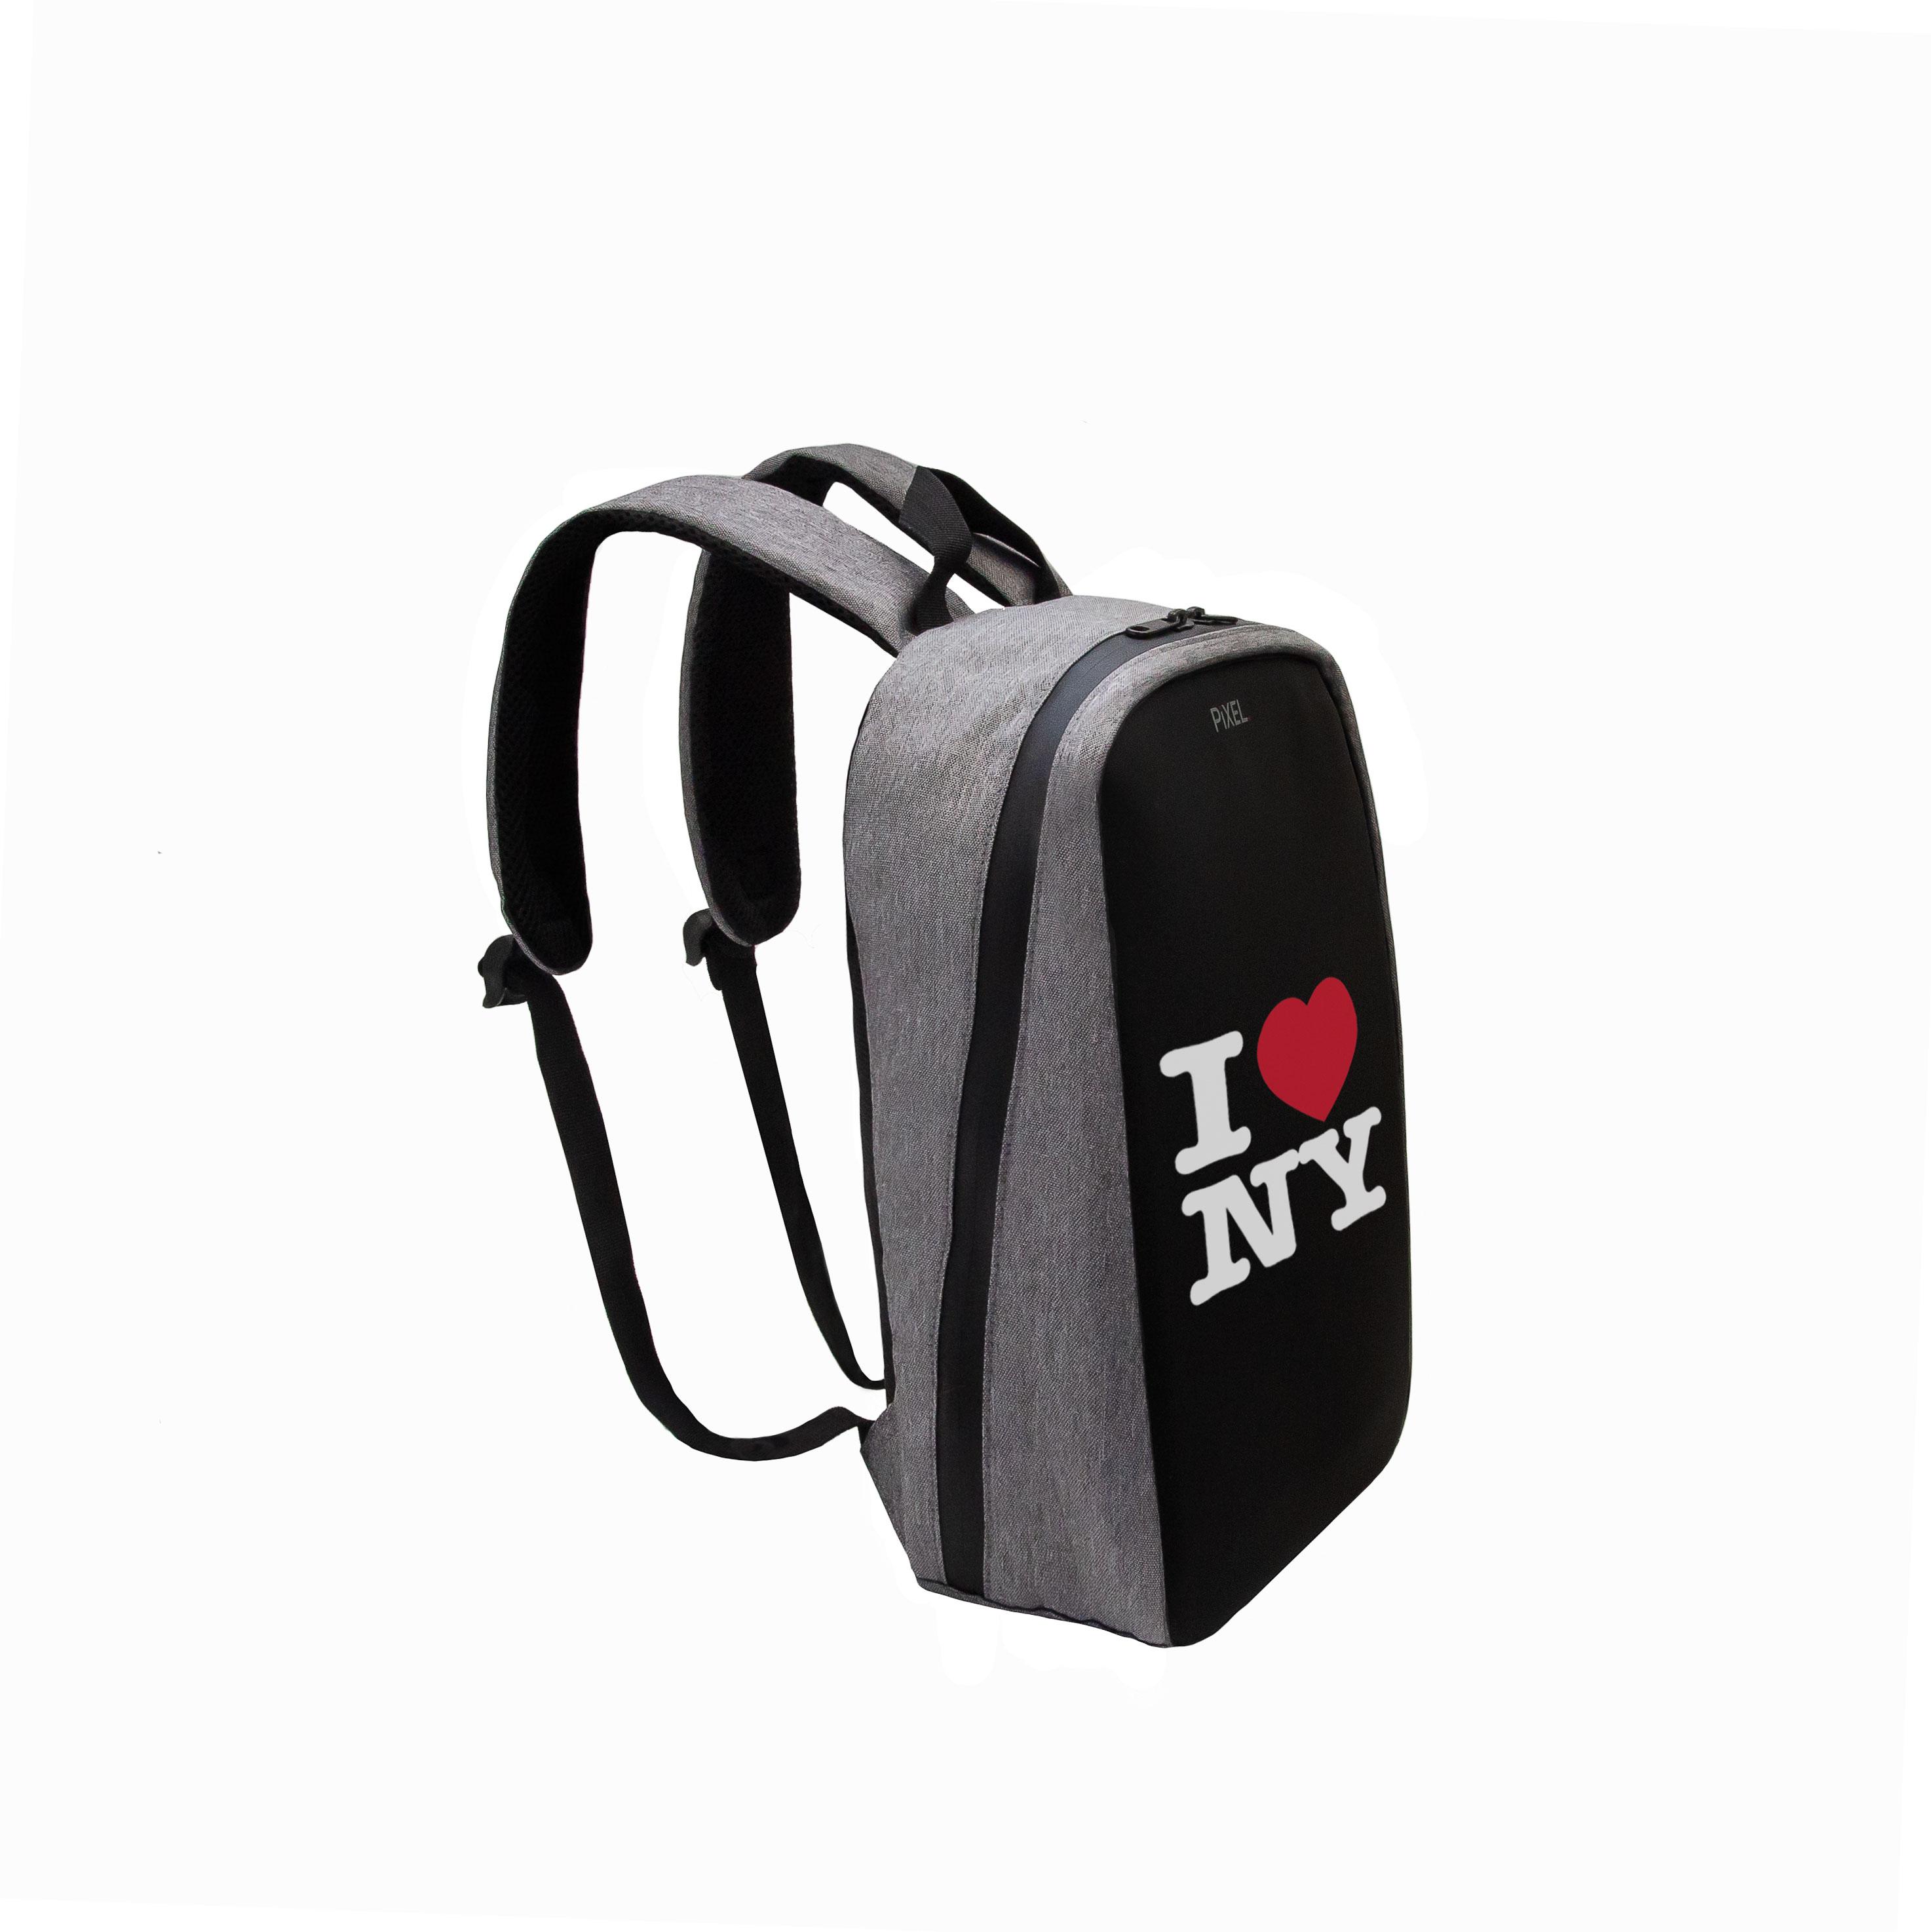 Рюкзак с LED-дисплеем PIXEL PLUS - GRAFIT серый